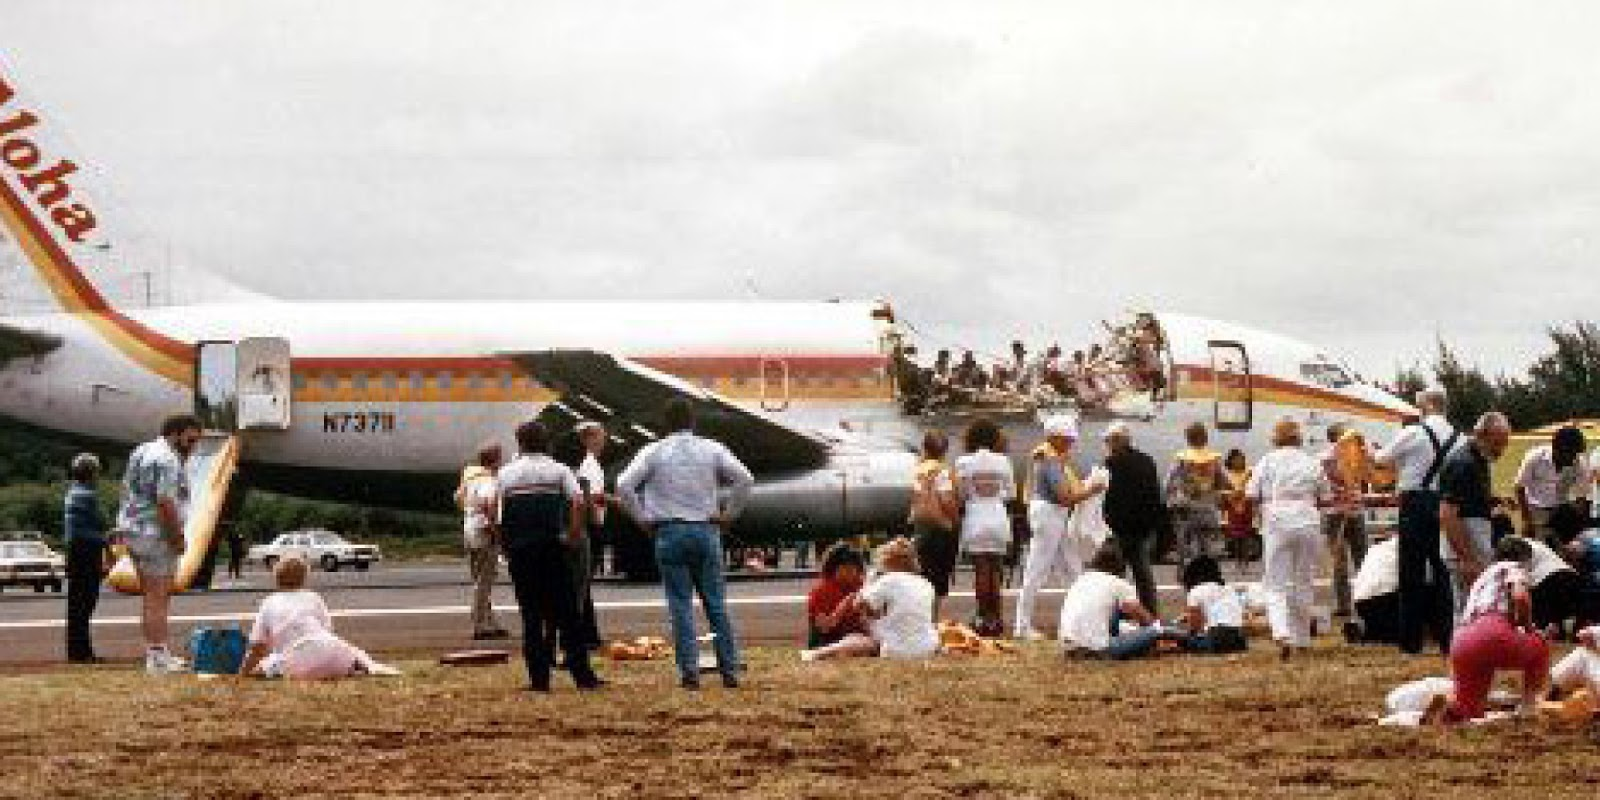 Aloha Airlines Flight 243